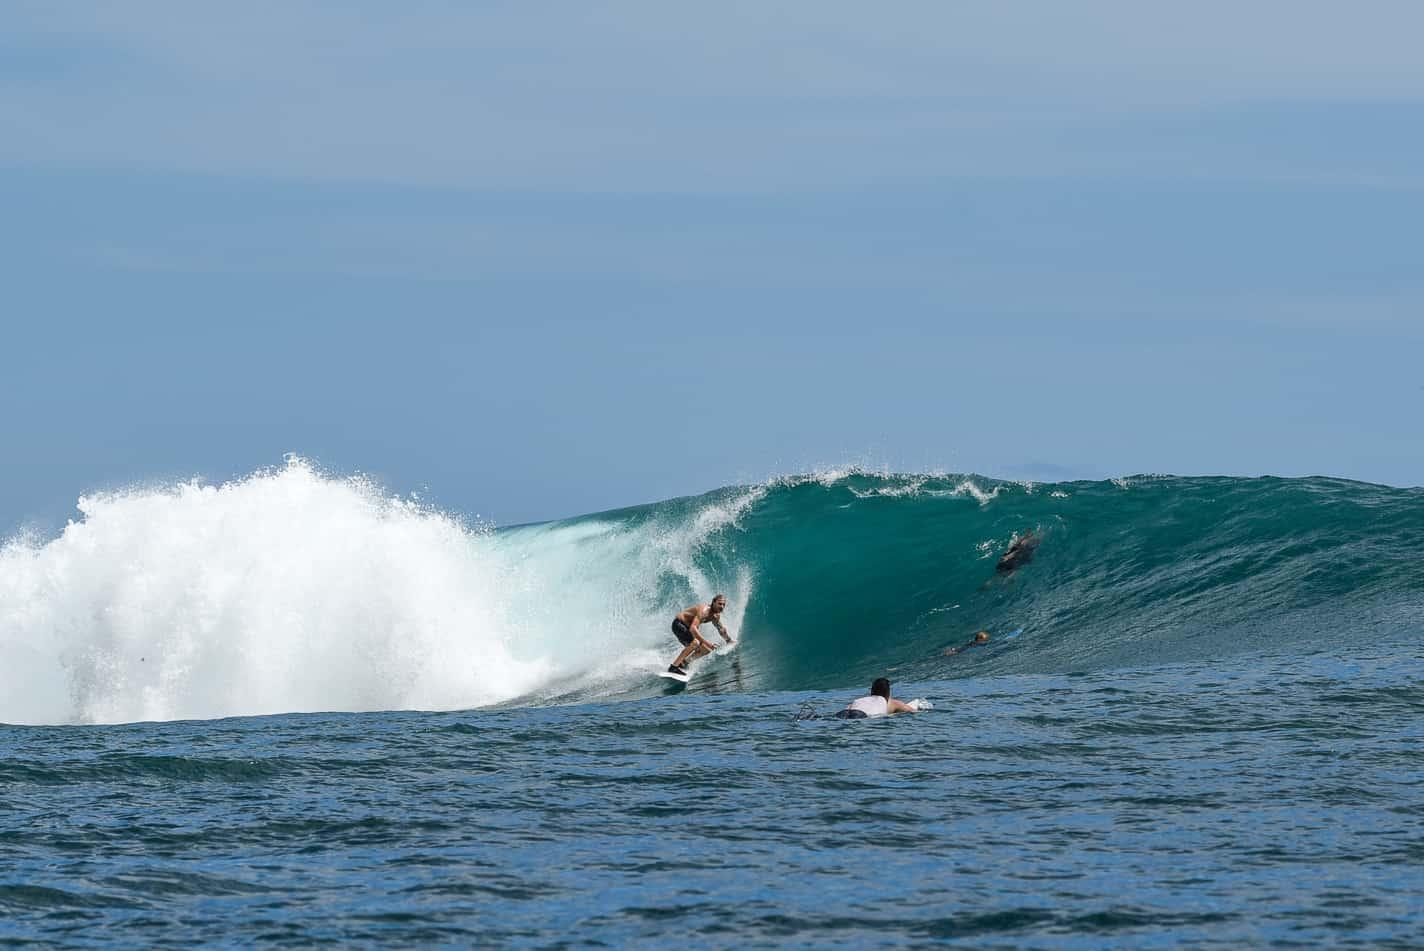 samoa surf wackas